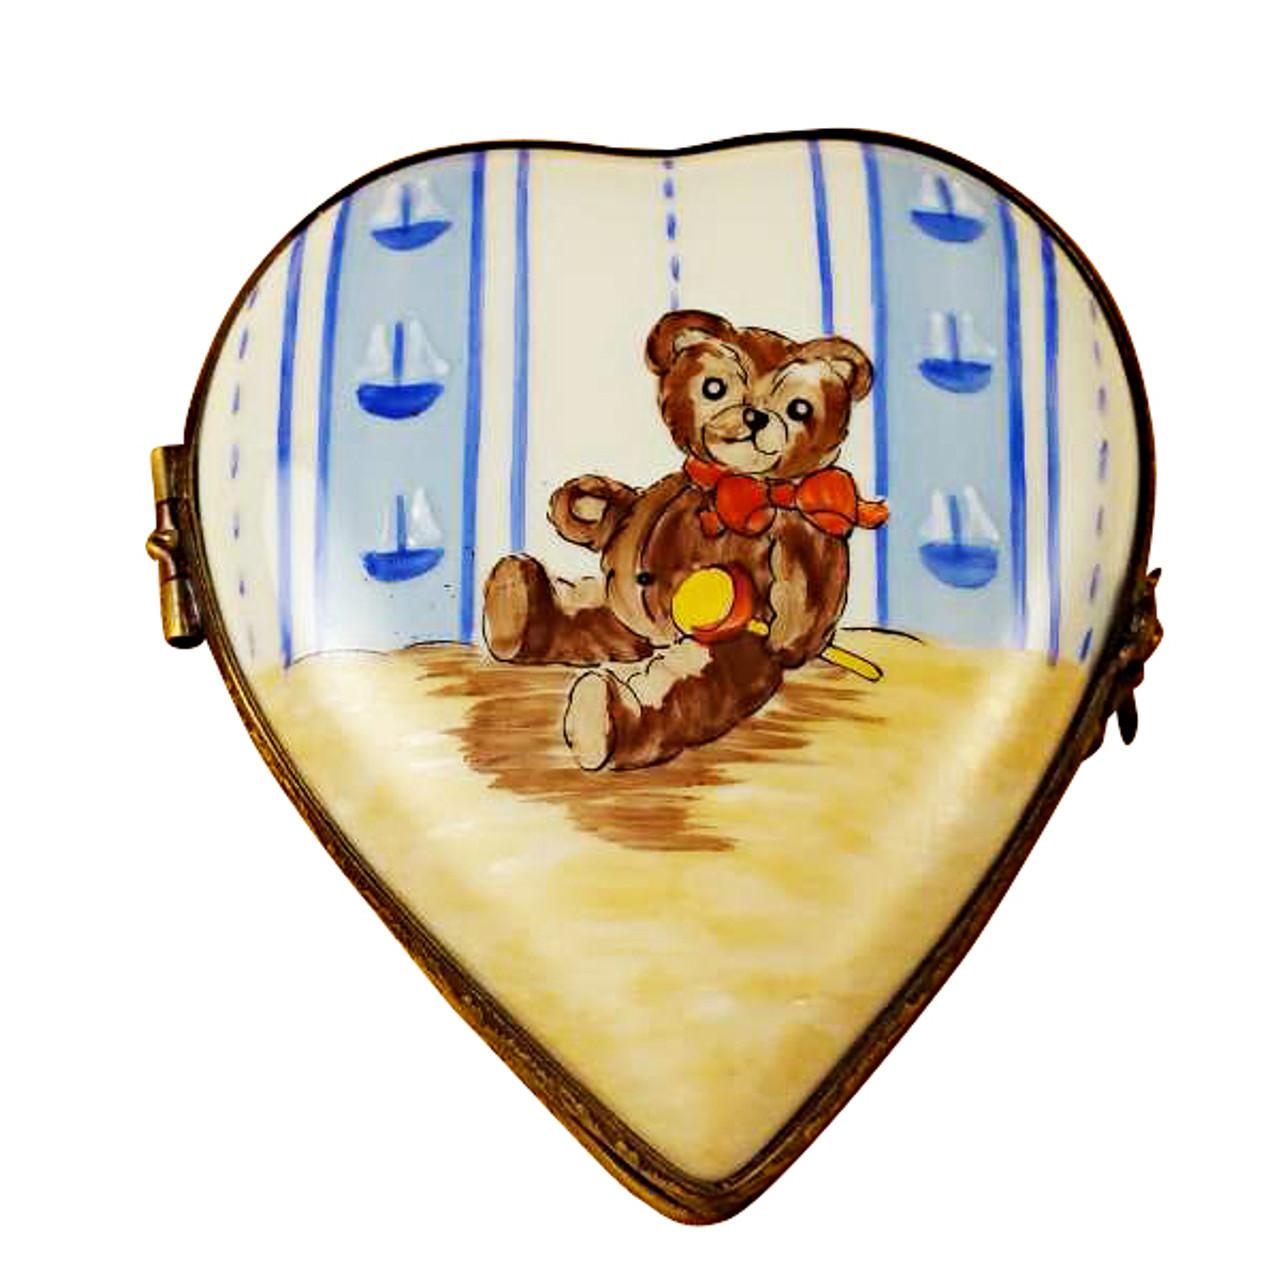 Limoges Imports Heart W/Teddy Bear Limoges Box